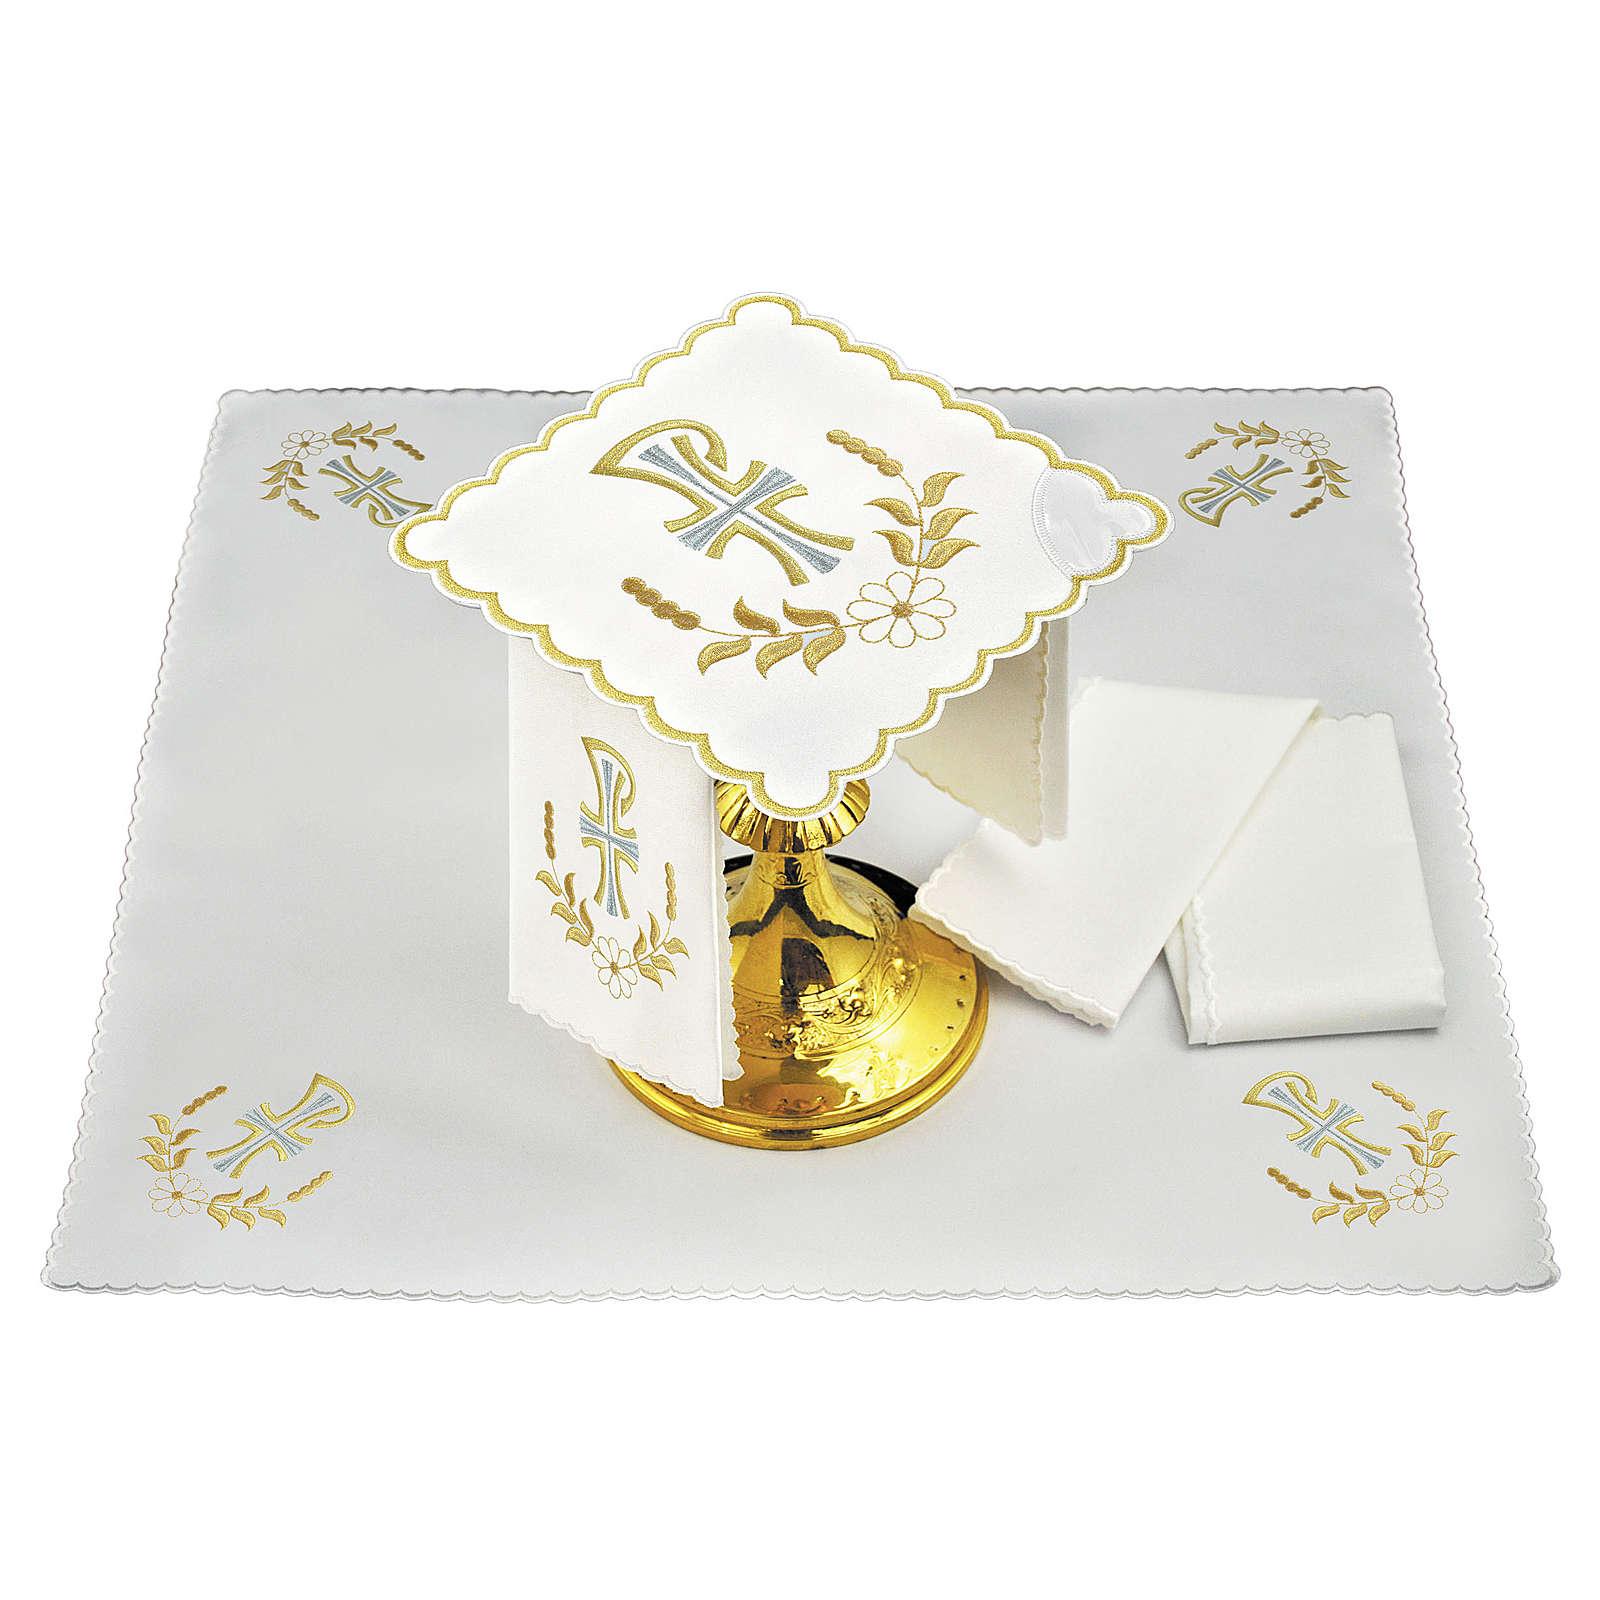 Altar linen daisy flower letter P with cross, cotton 4